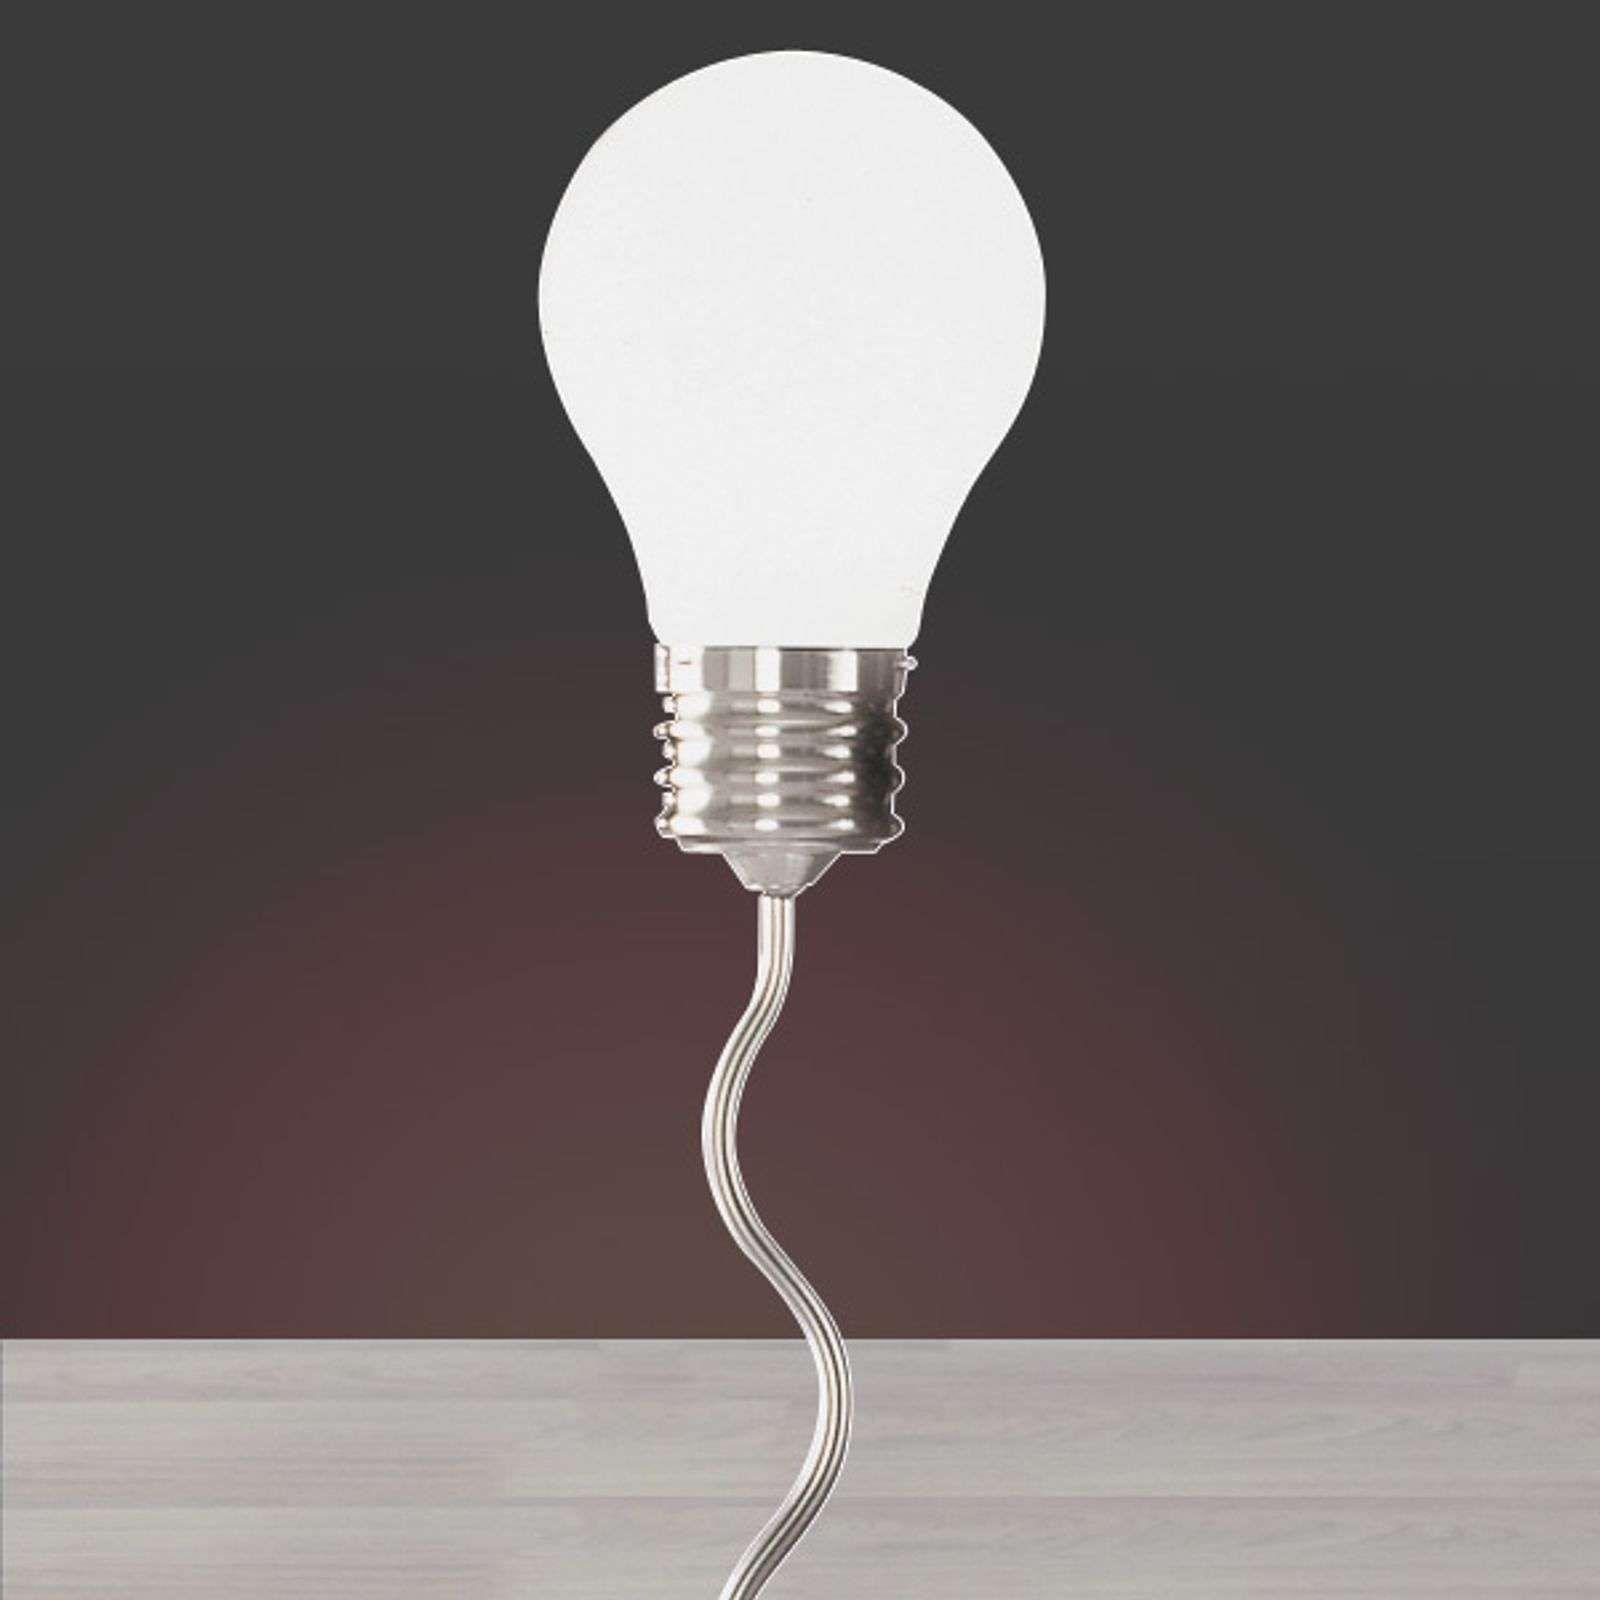 Led Lampe Ohne Kabel Badezimmer Wandleuchte Led Deckenlampe Flur Lang Lampensockel G9 Pendelleuchte Wohnzi Lampen Und Leuchten Lampen Stehlampe Dimmbar